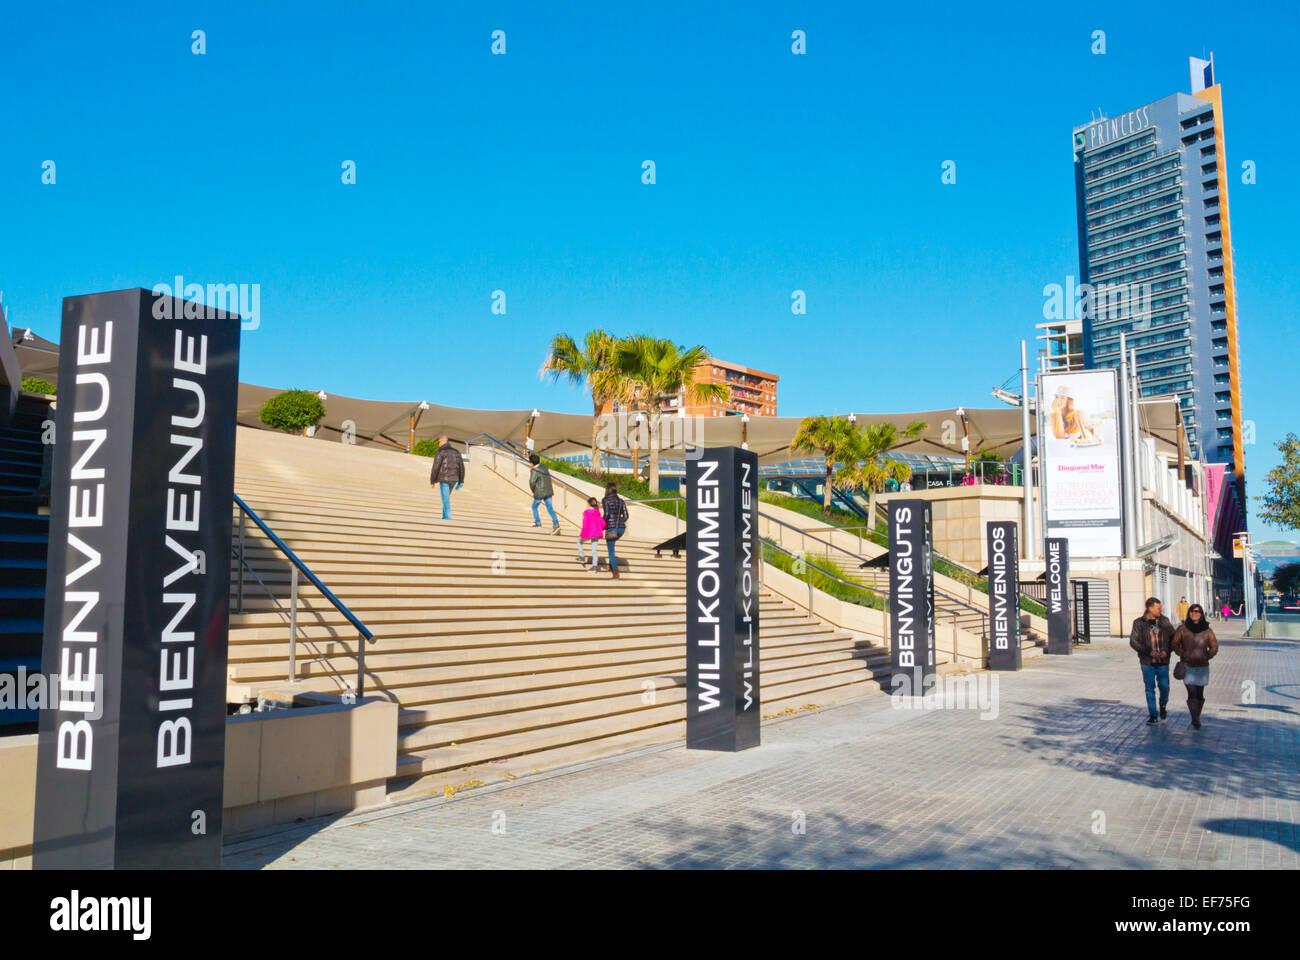 Centre Comercial Diagonal Mar, biggest shopping centre in Catalonia, and Hotel Princess, Diagonal Mar, Sant Marti, Stock Photo